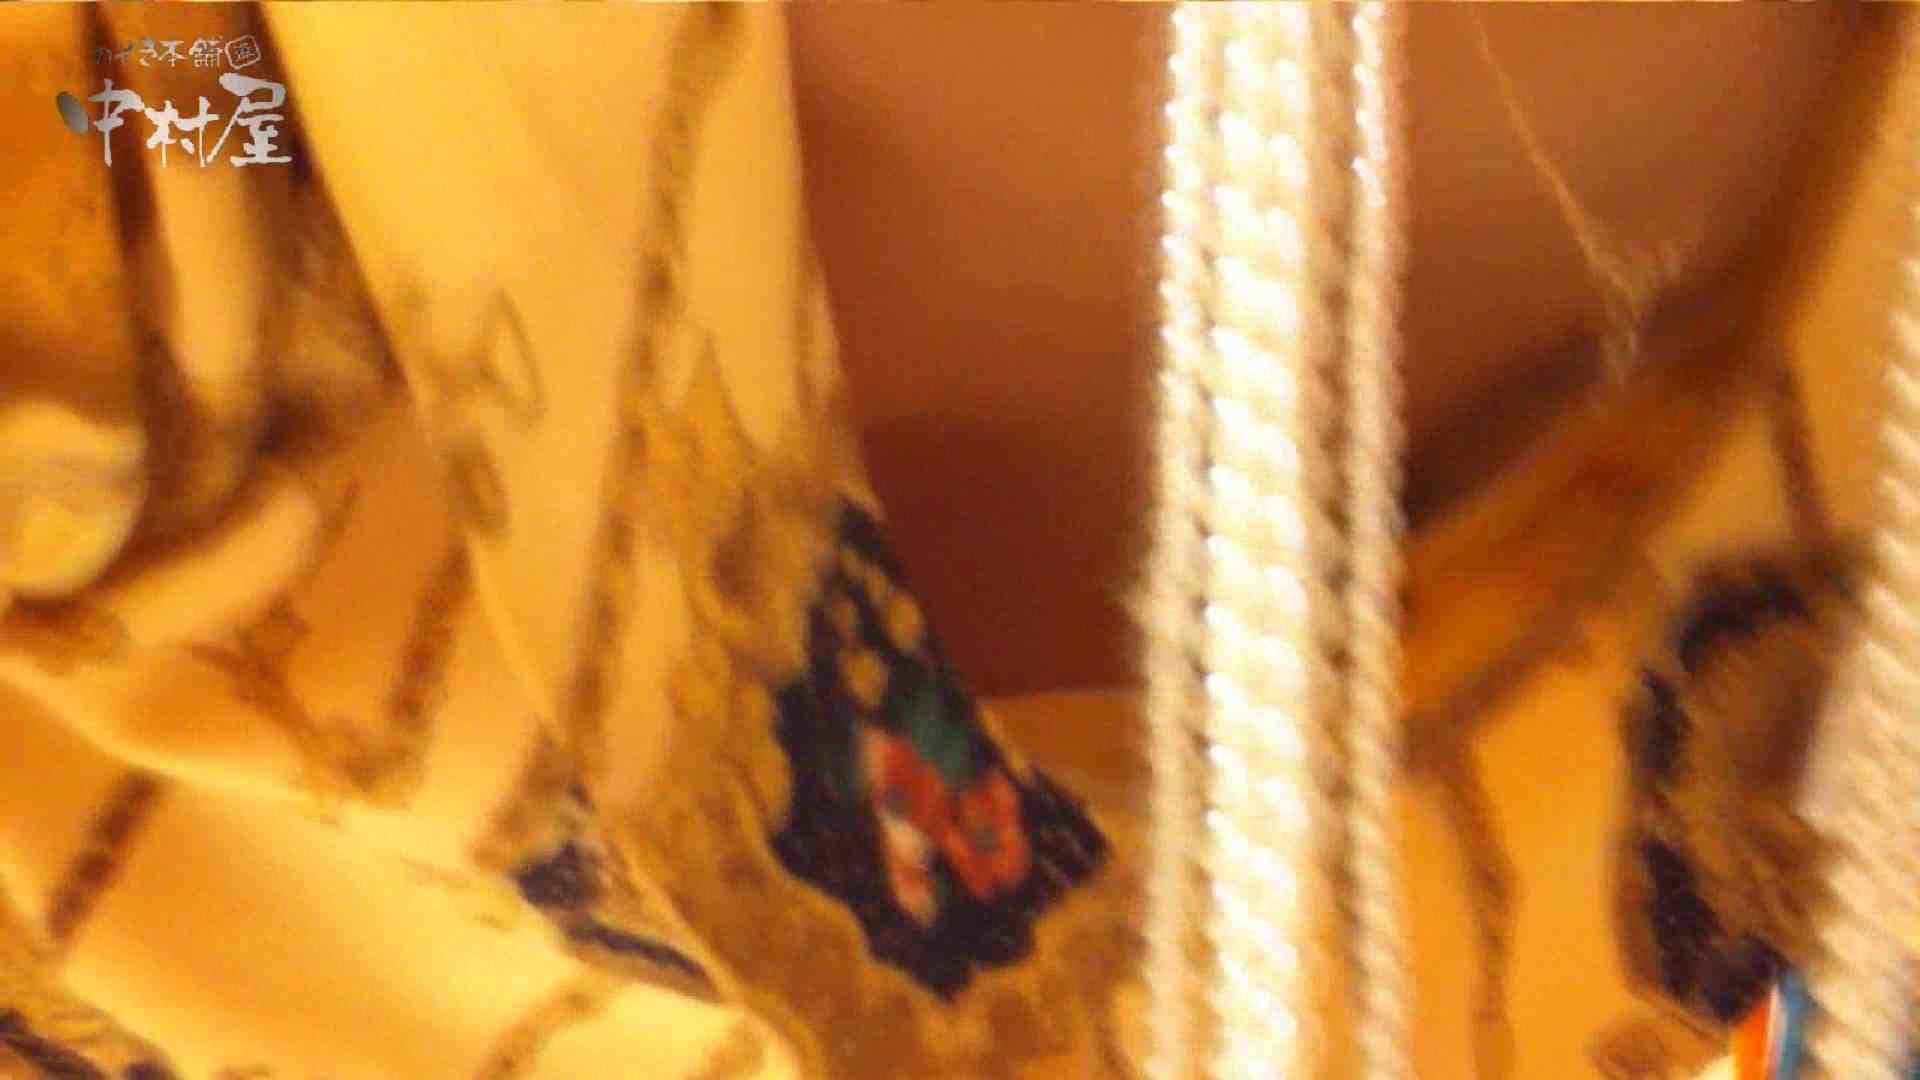 vol.71 美人アパレル胸チラ&パンチラ クイコミパンツでお買い物 美人 AV無料動画キャプチャ 65連発 61